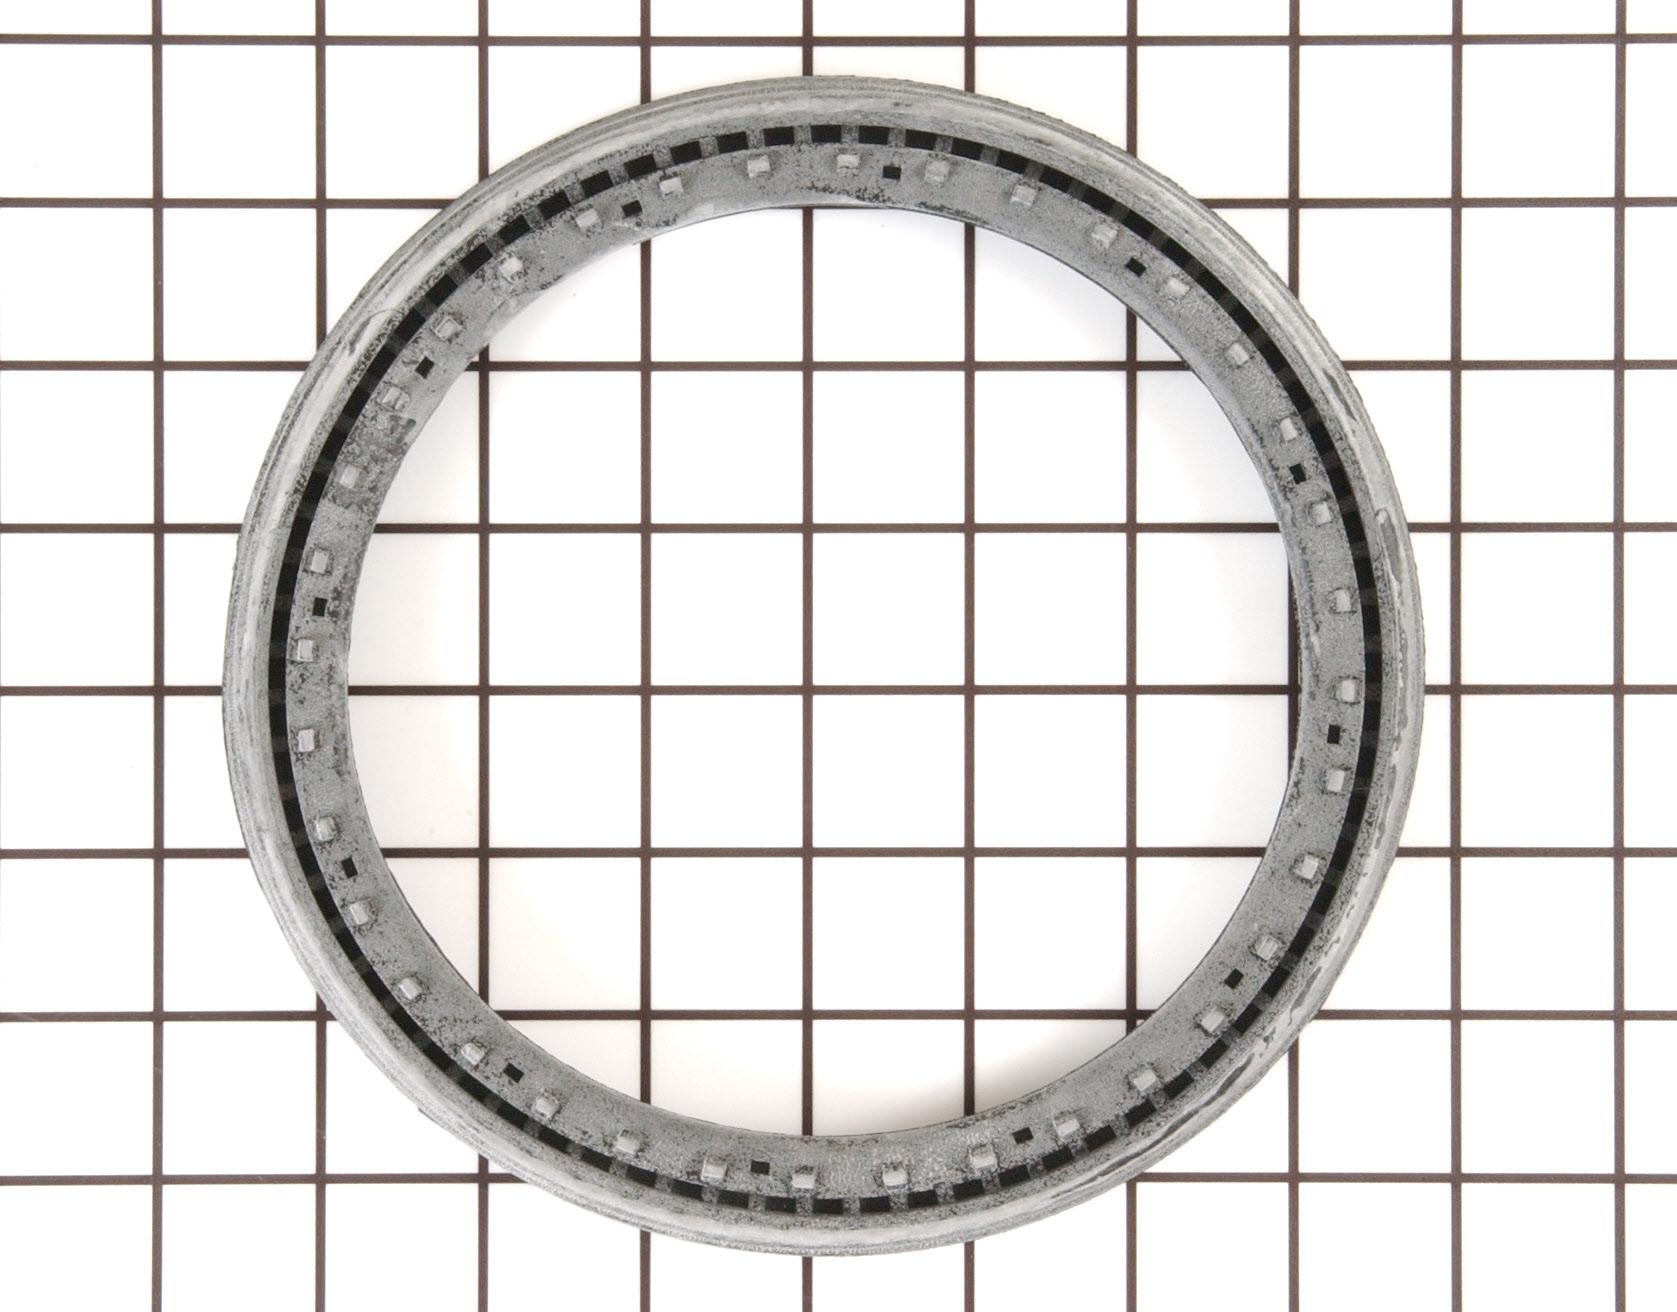 WP6-917025 Crosley Dishwasher Part -Pump Gasket